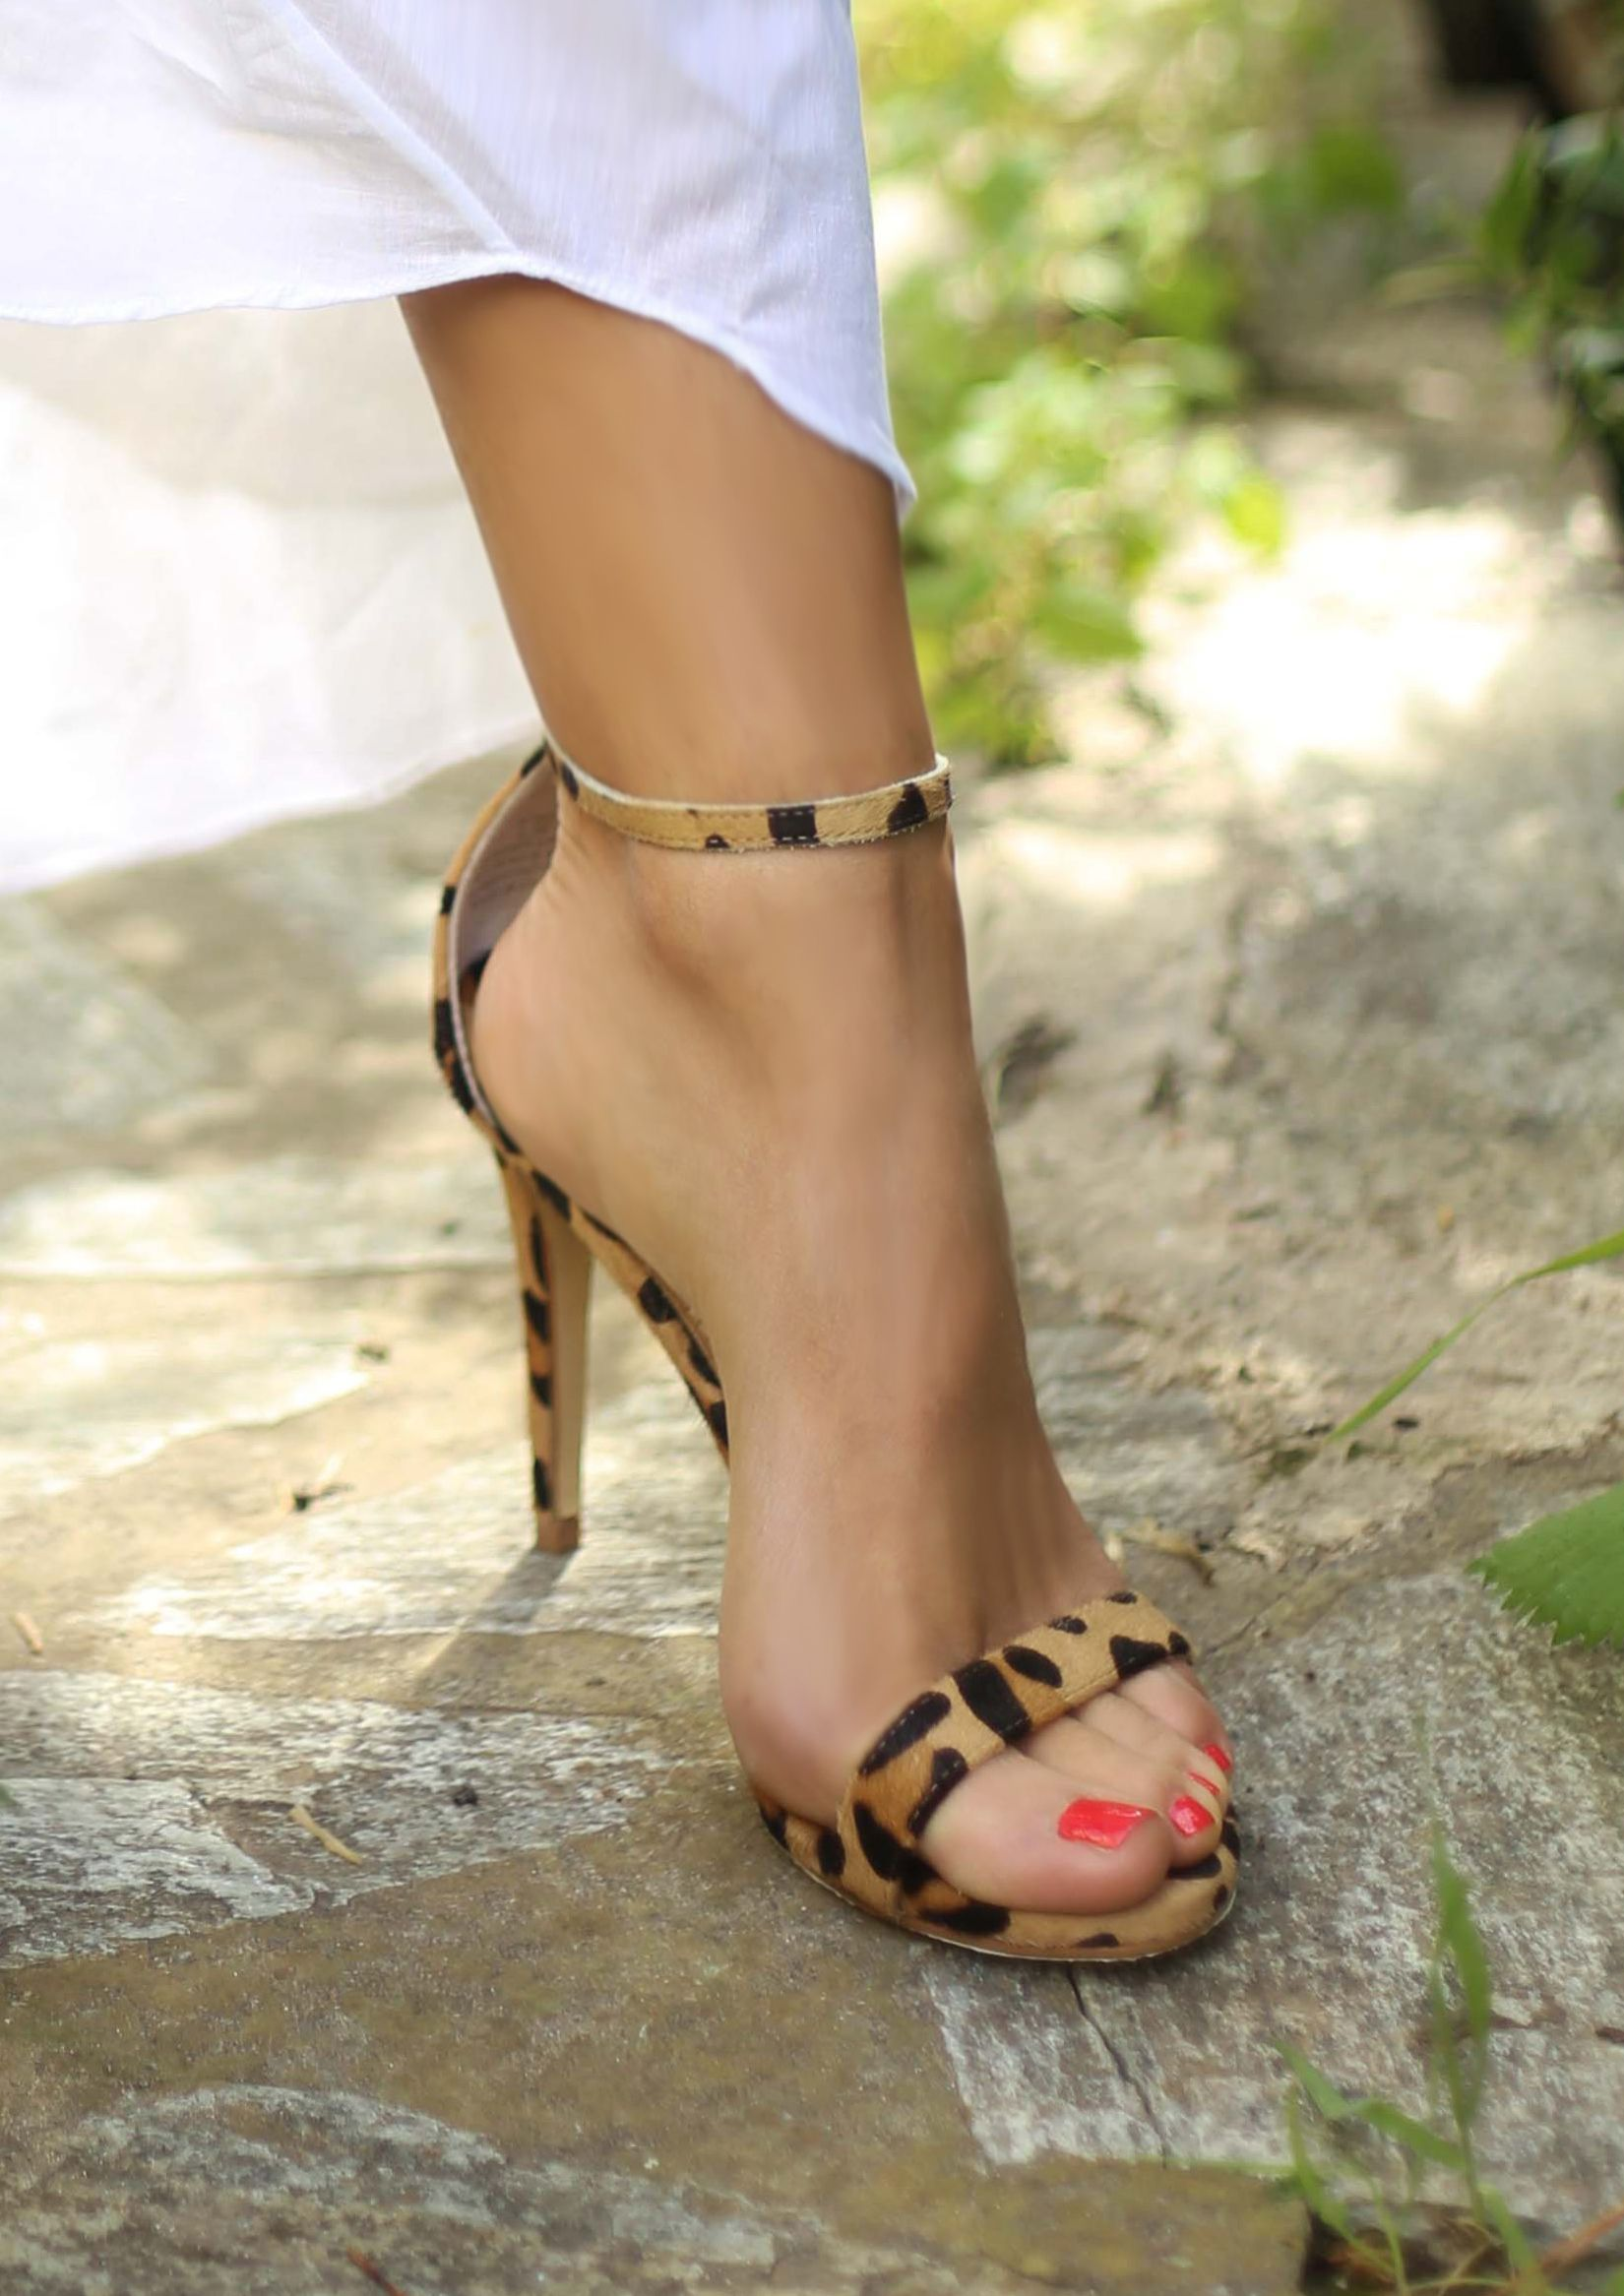 ca61ed99d She has nice toenails. Worn by Maria Iliaki. Toenails, Fashion Addict, Shoes